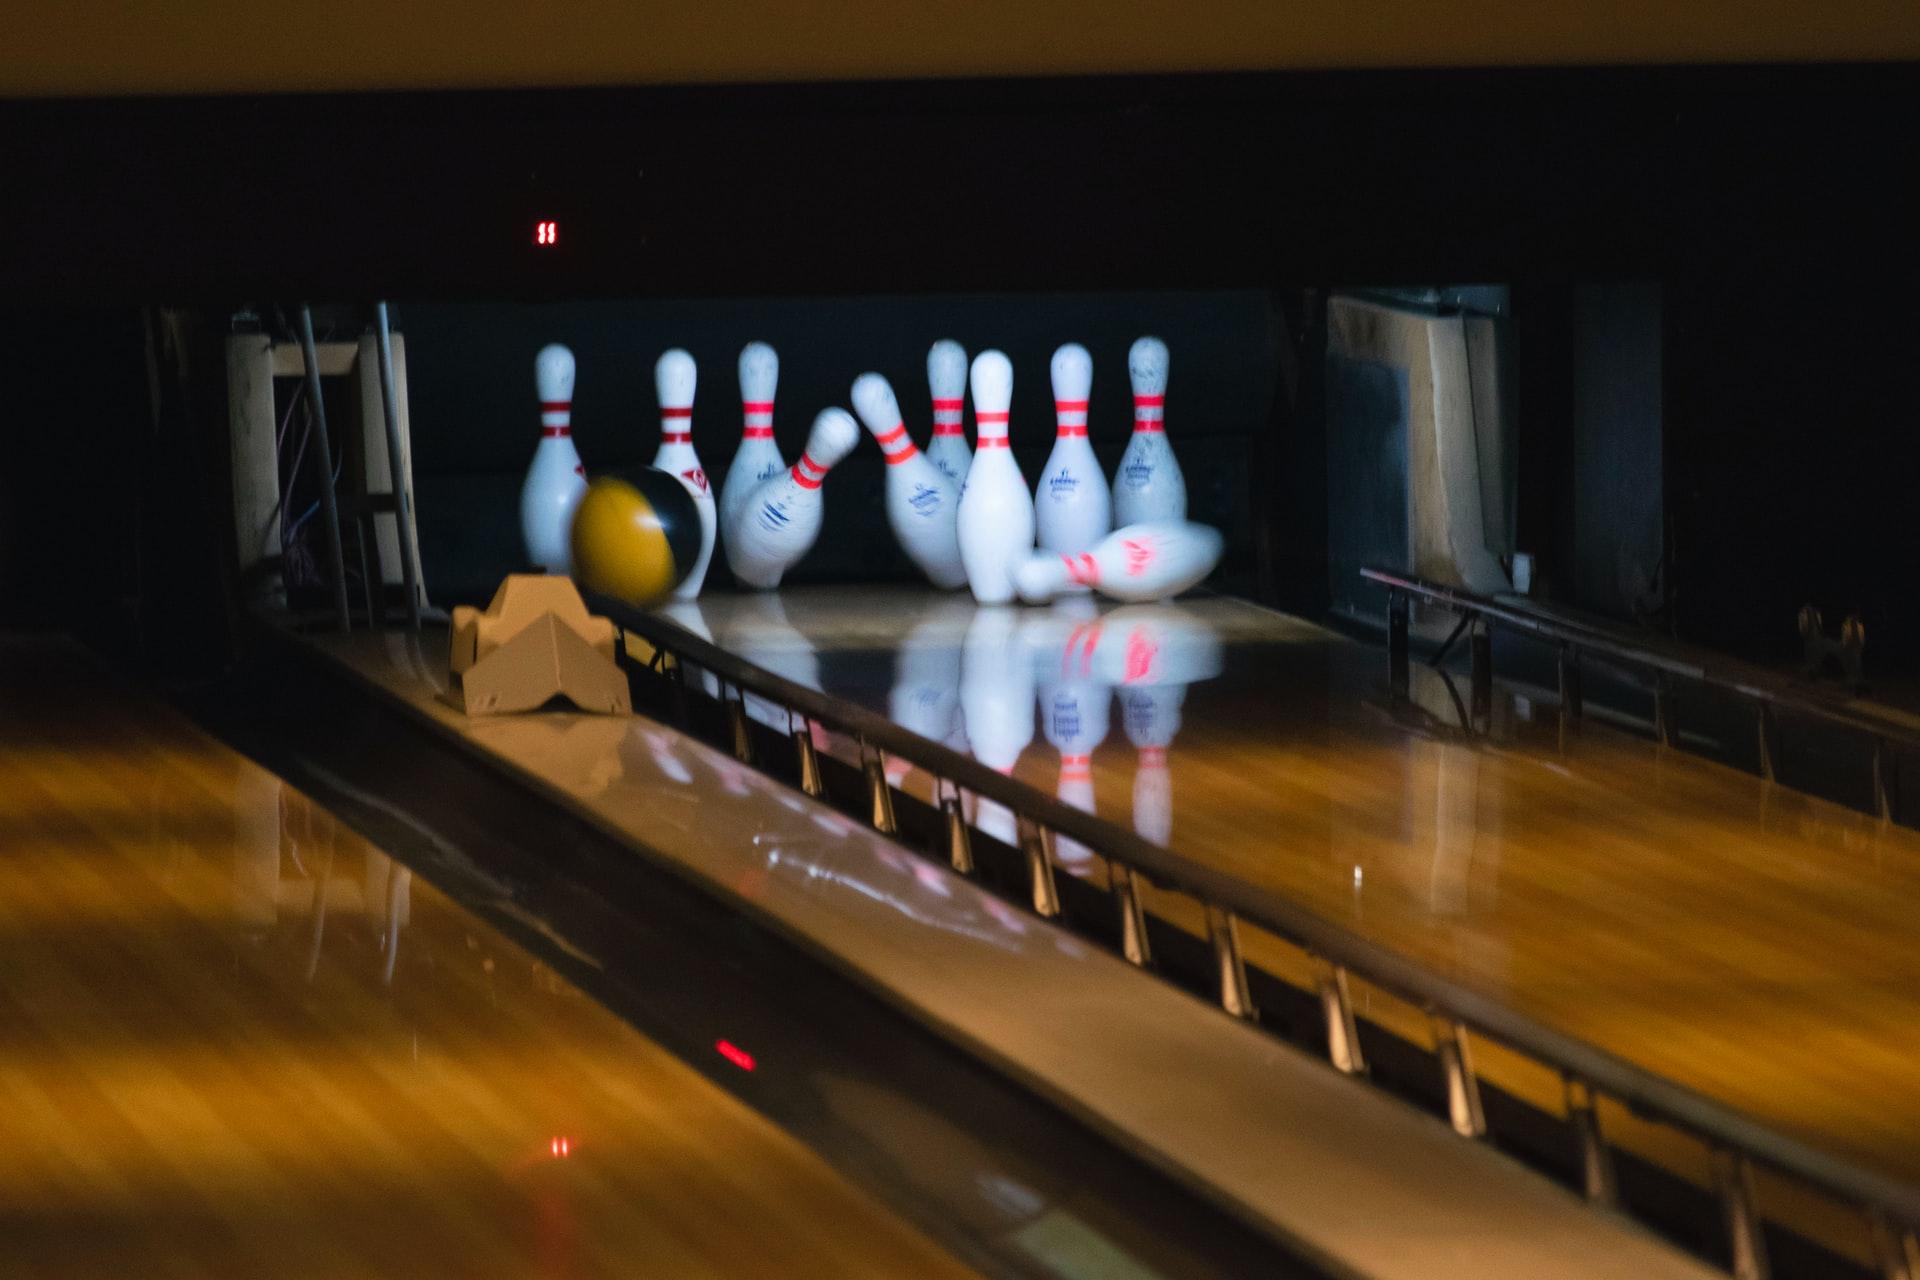 Bowling ball strikes bowling pins